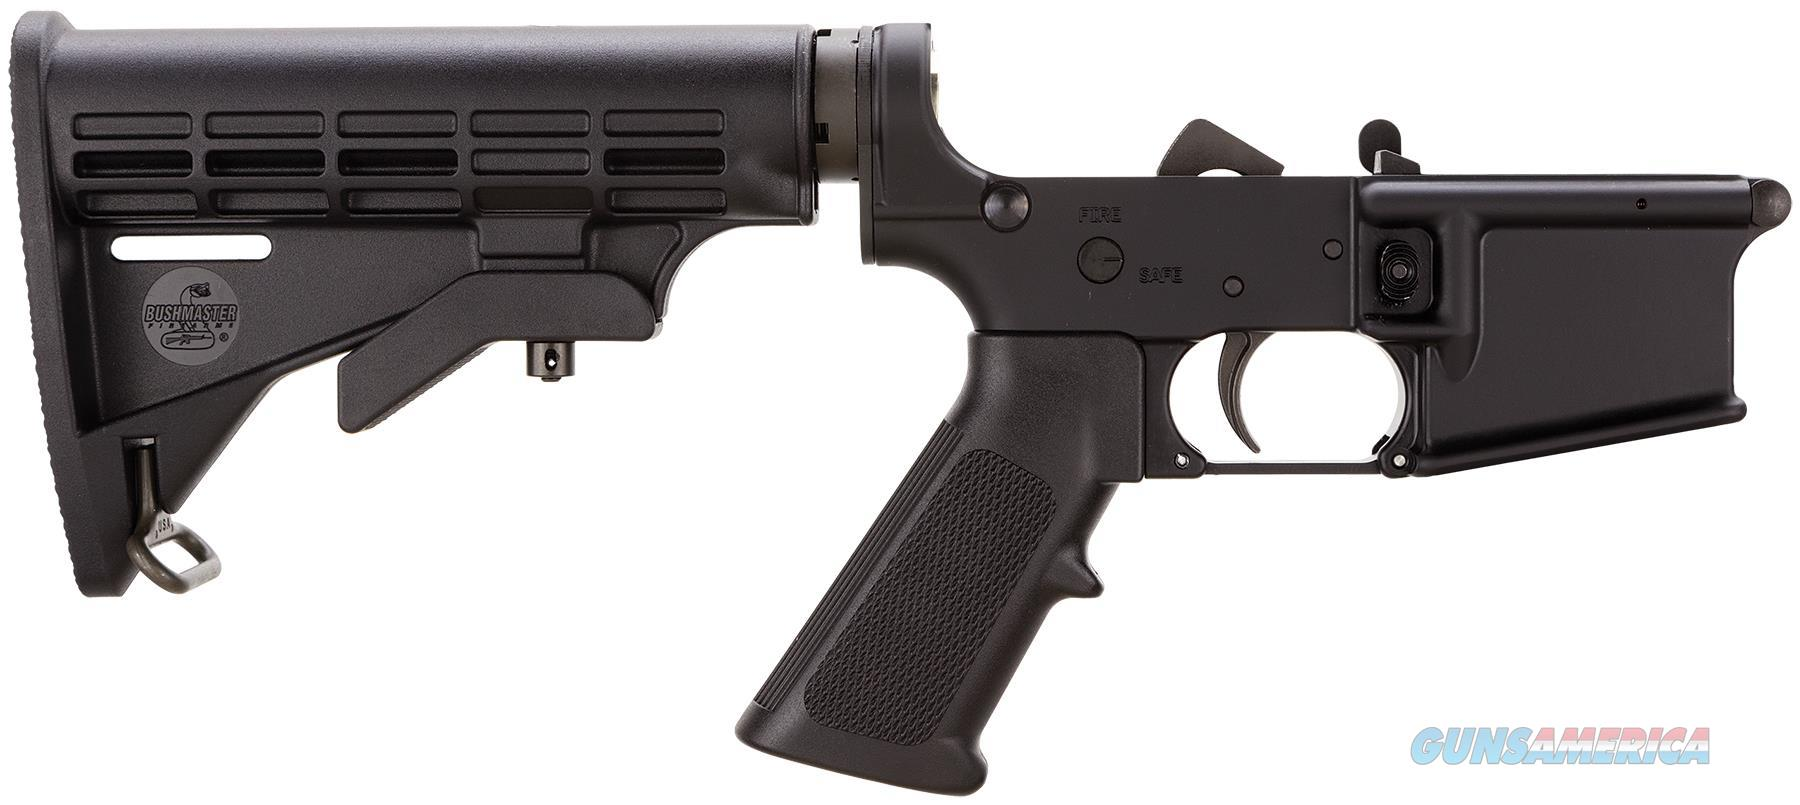 Bushmaster 92952 Ar-15 Lower Receiver Multi Caliber Marked 6 Pos Stk 92952  Guns > Rifles > B Misc Rifles